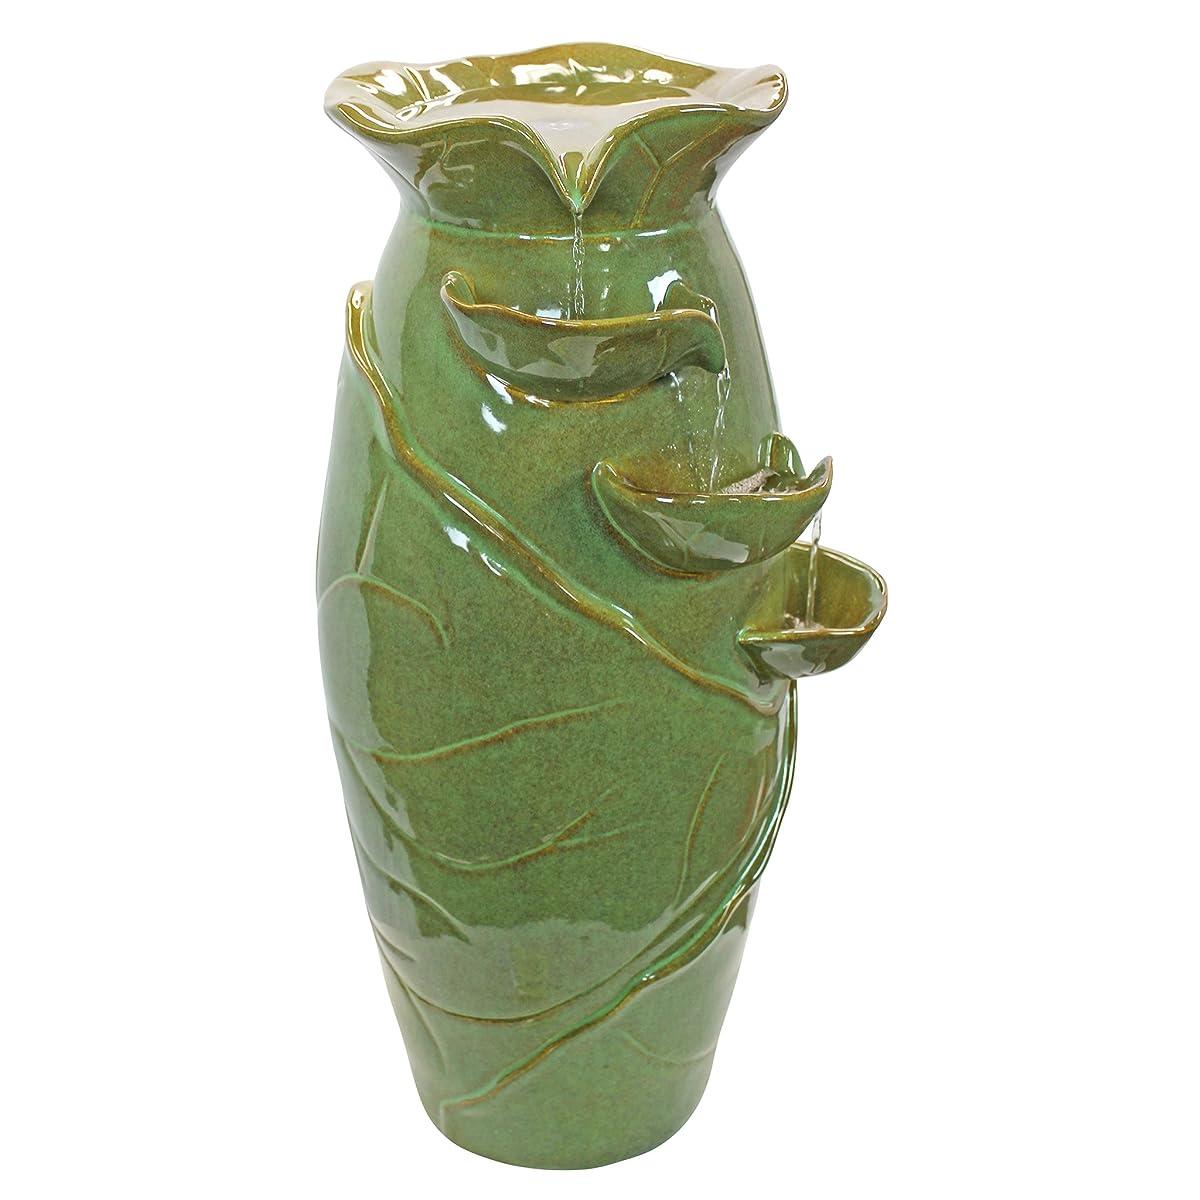 Water Fountain - Ceramic Vines Water Jug Garden Decor Fountain - Outdoor Water Feature